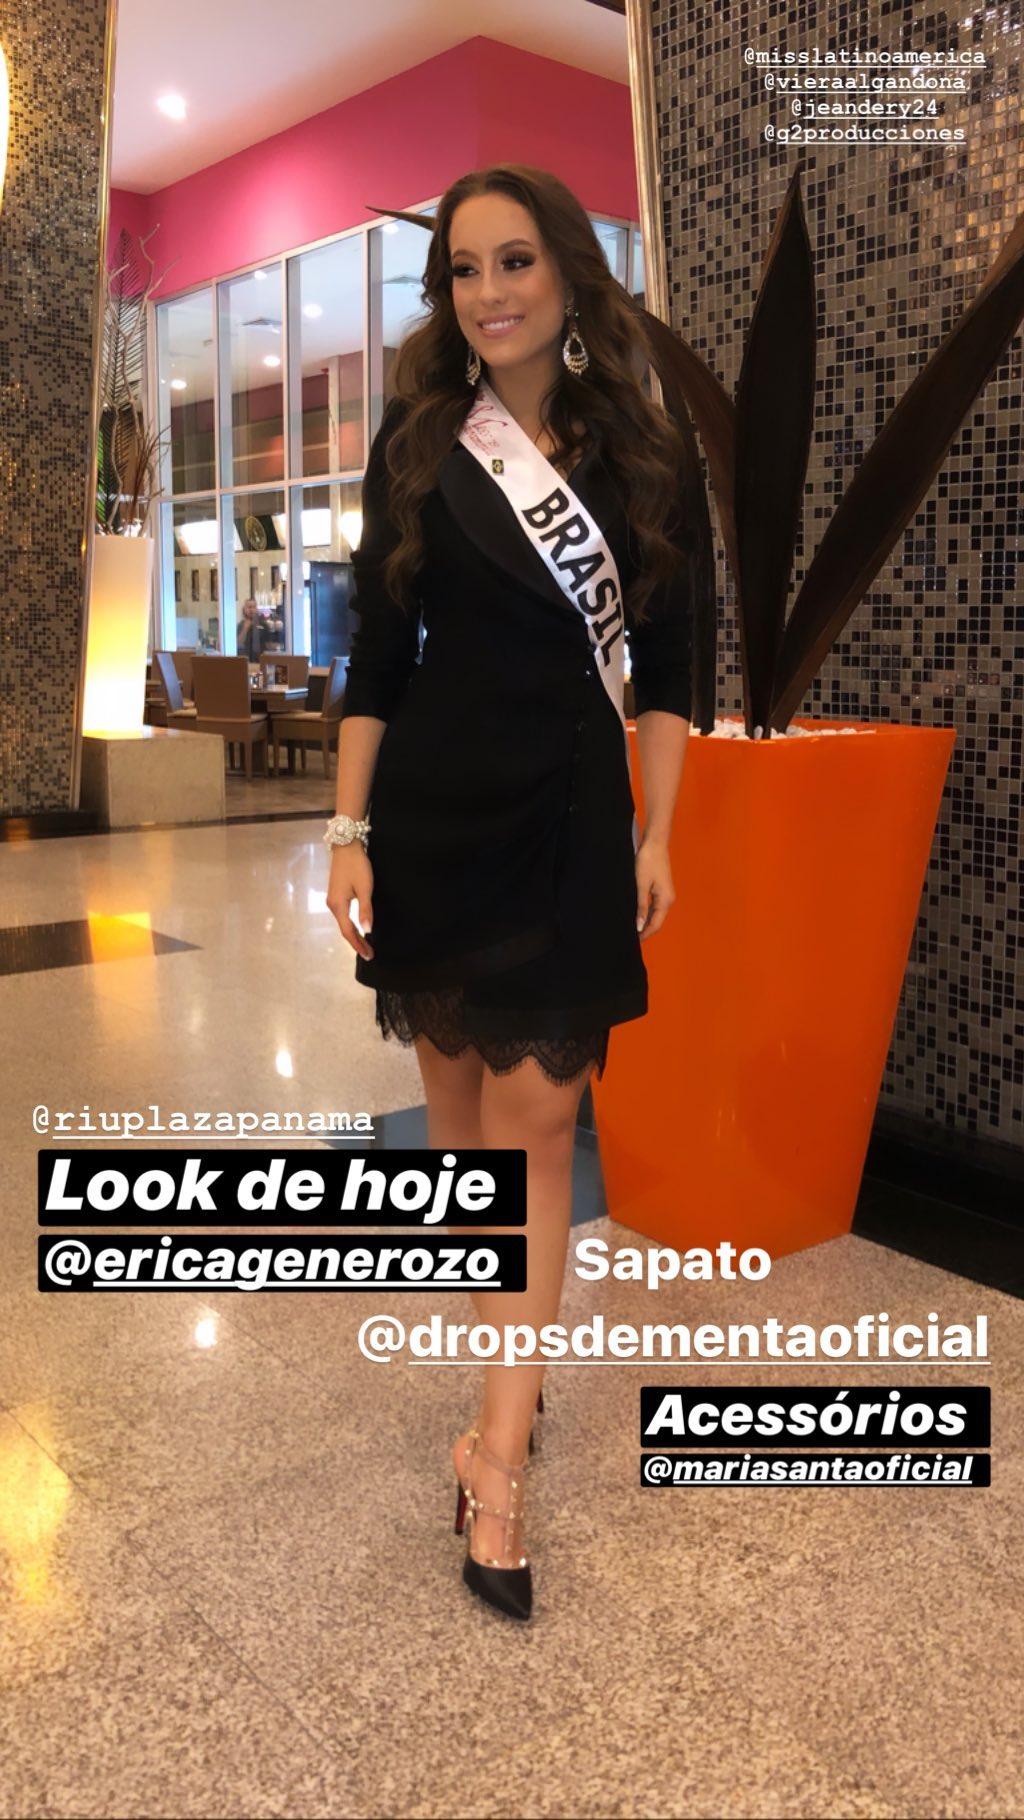 cristine boff sartor, segunda finalista de miss latinoamerica 2019. - Página 8 70457910